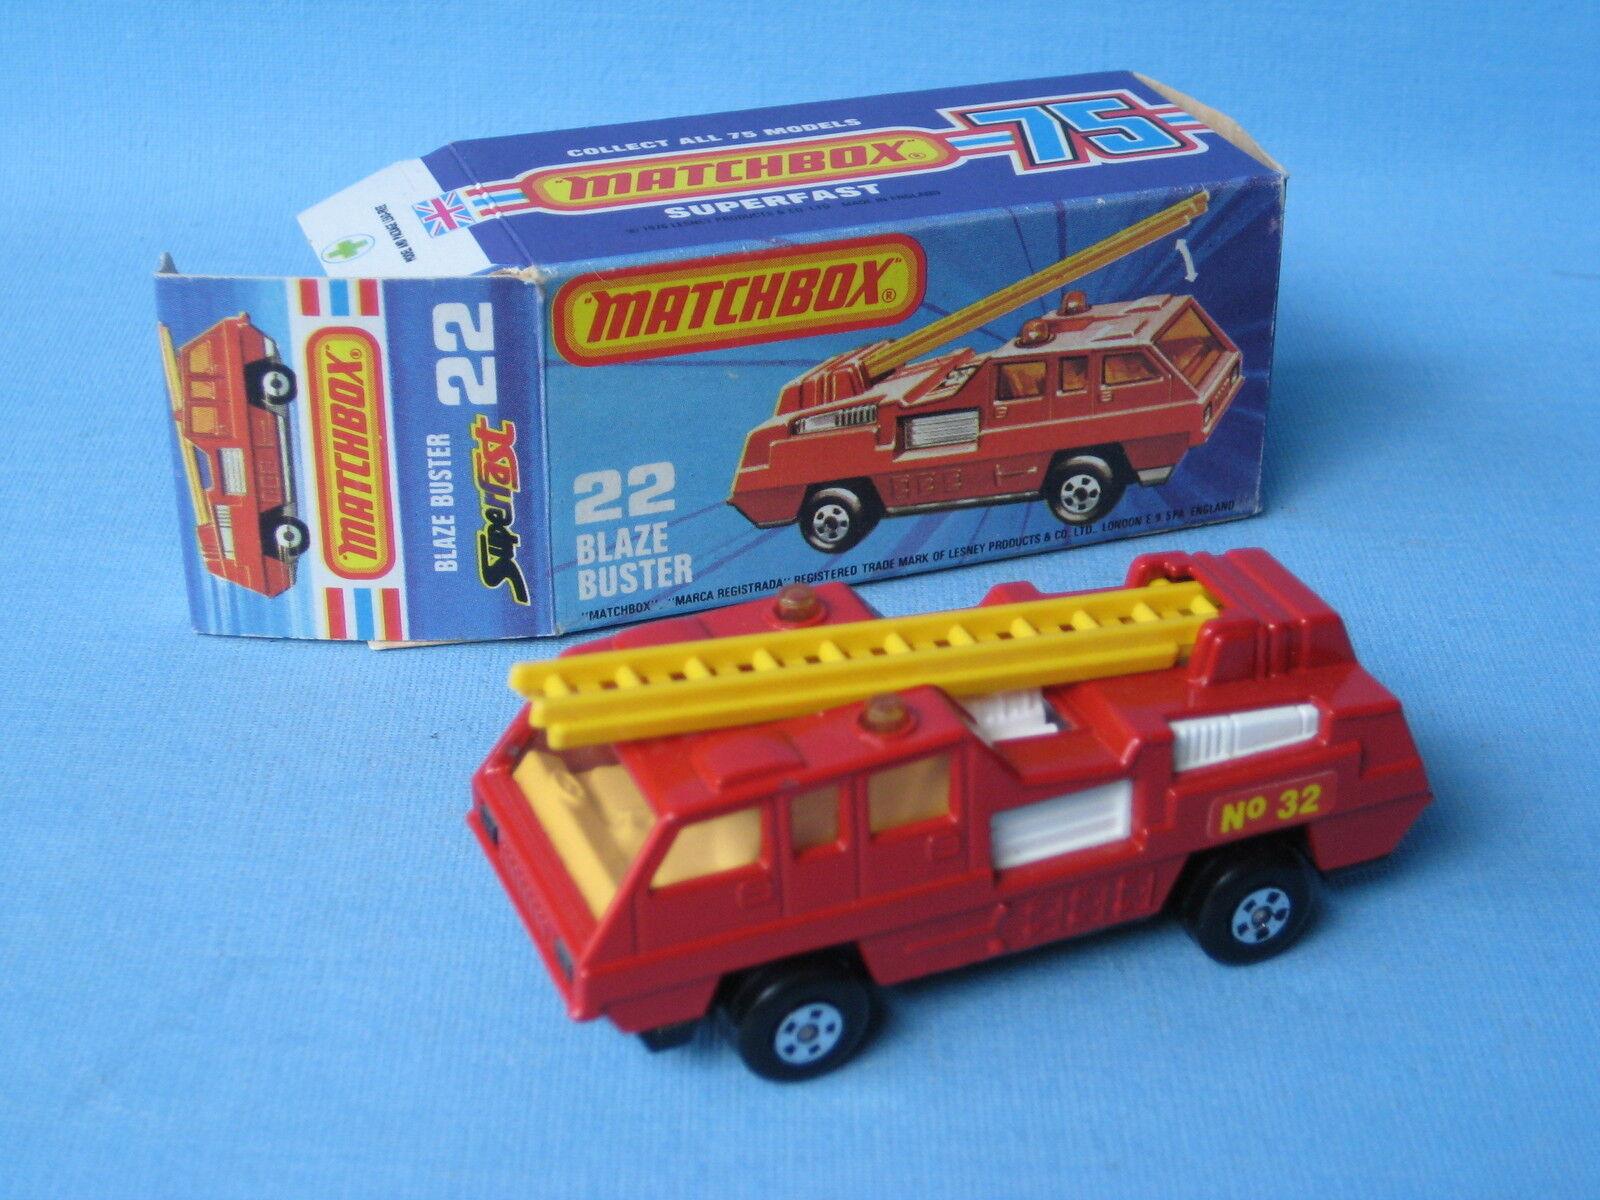 estar en gran demanda Lesney Matchbox súperfast 22 Blaze Buster bomberos Nº 32 32 32 Etiquetas En Caja  ordenar ahora